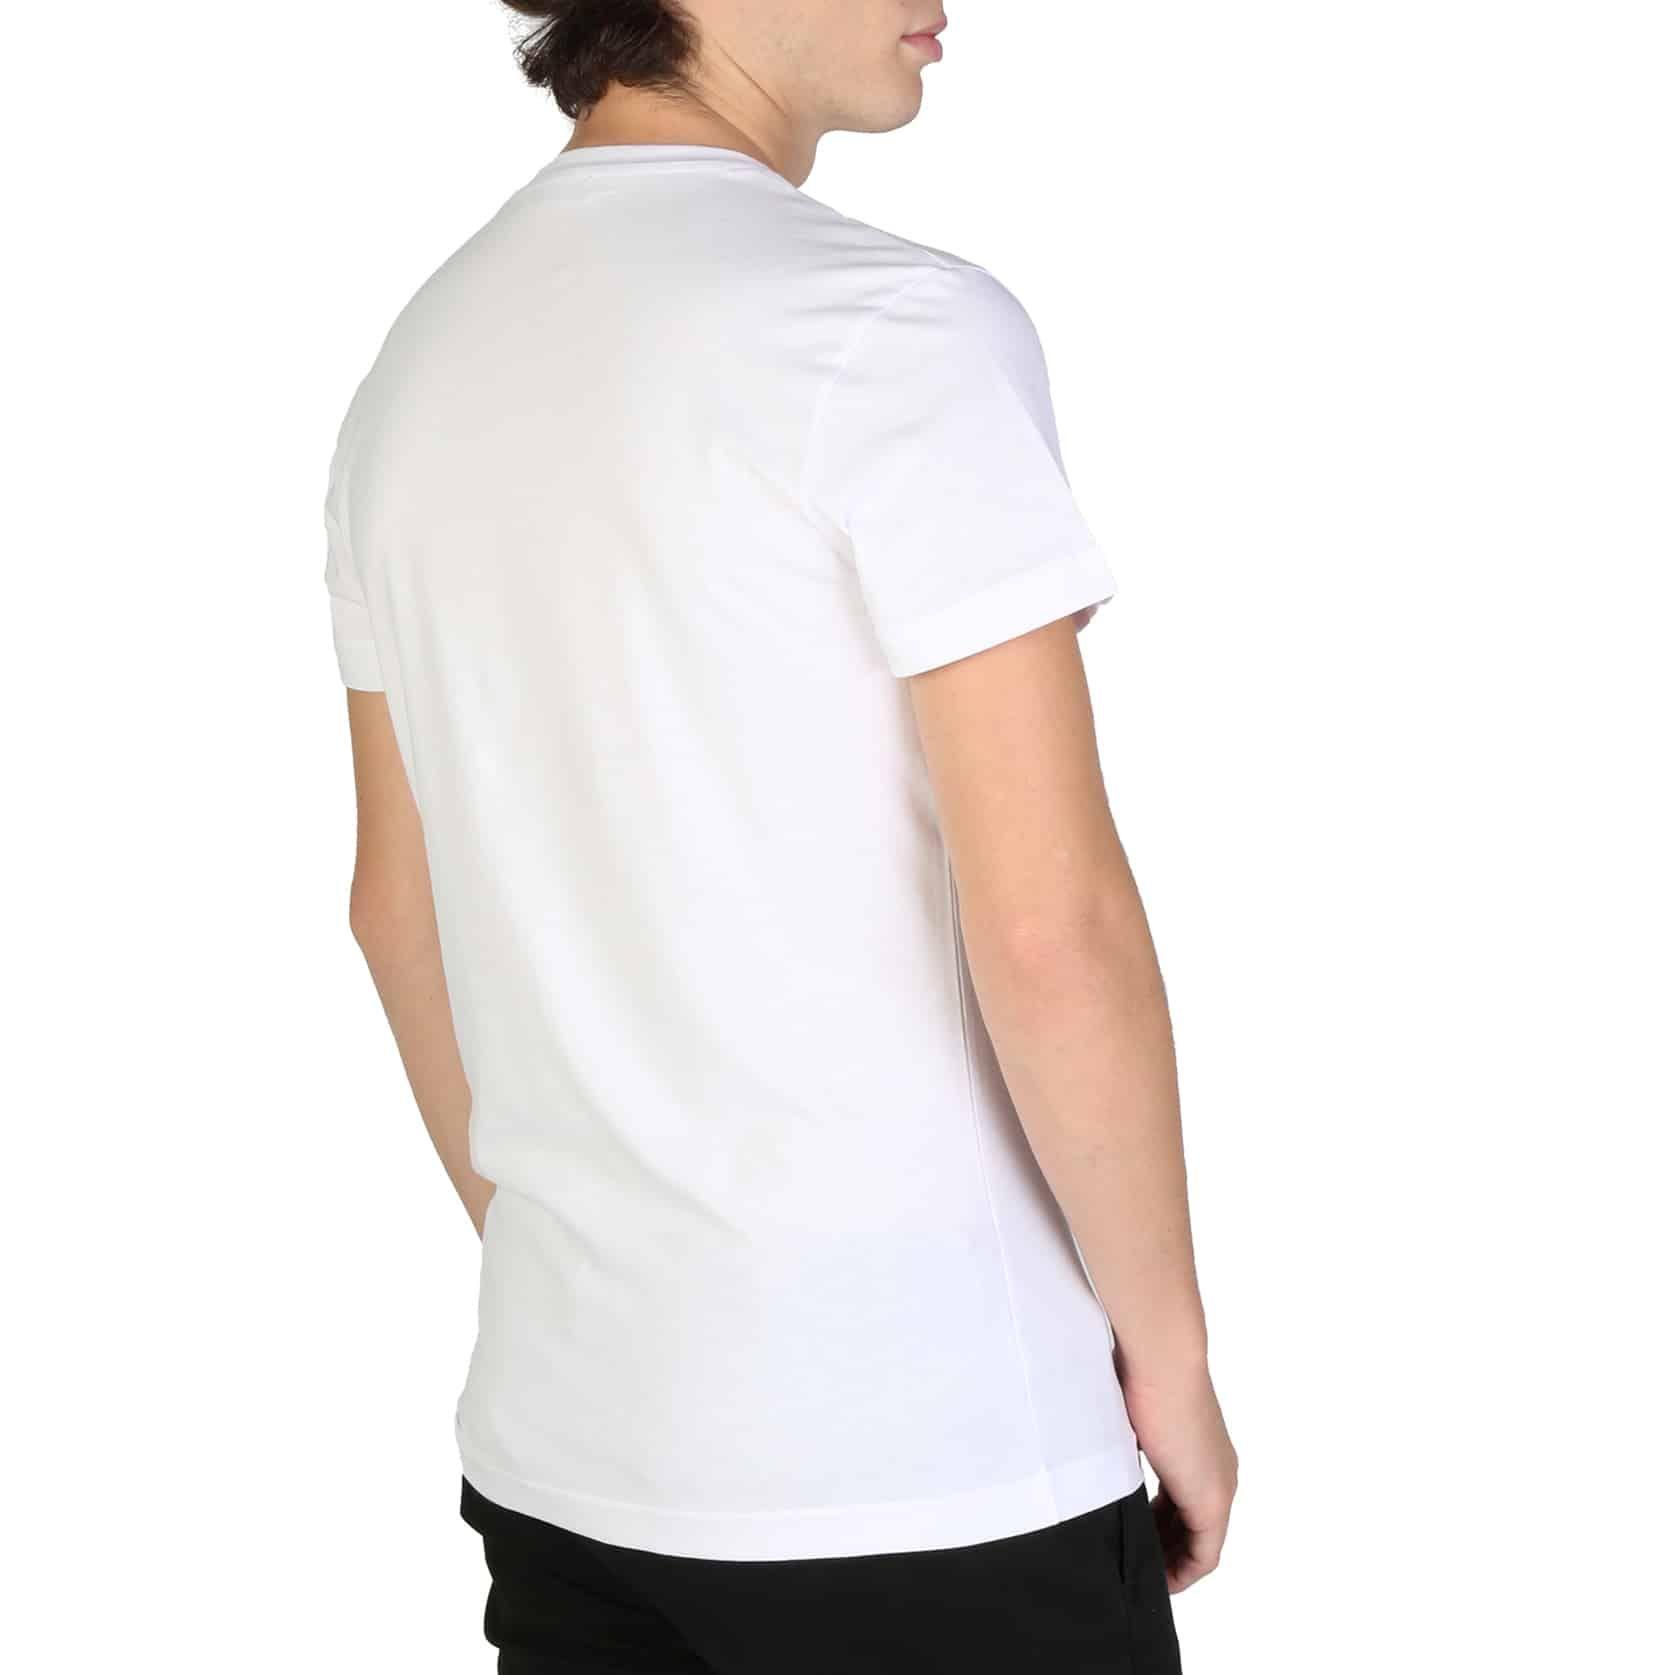 T-shirts Versace Jeans – B3GSB73A_36598